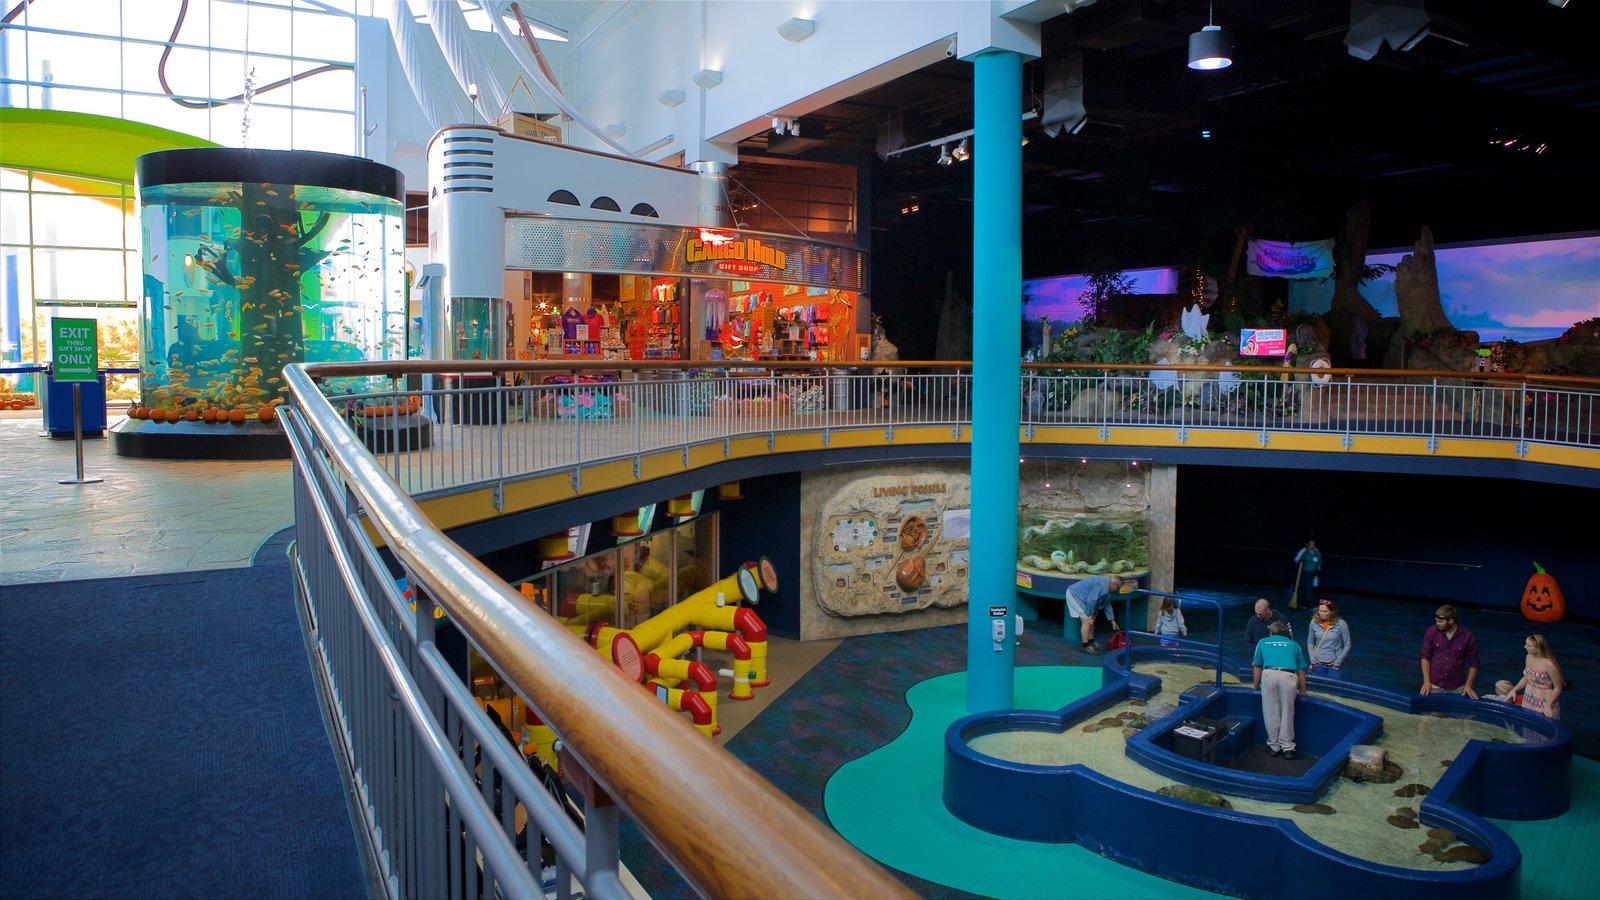 Ripley\'s Aquarium caracterizando vida marinha e vistas internas